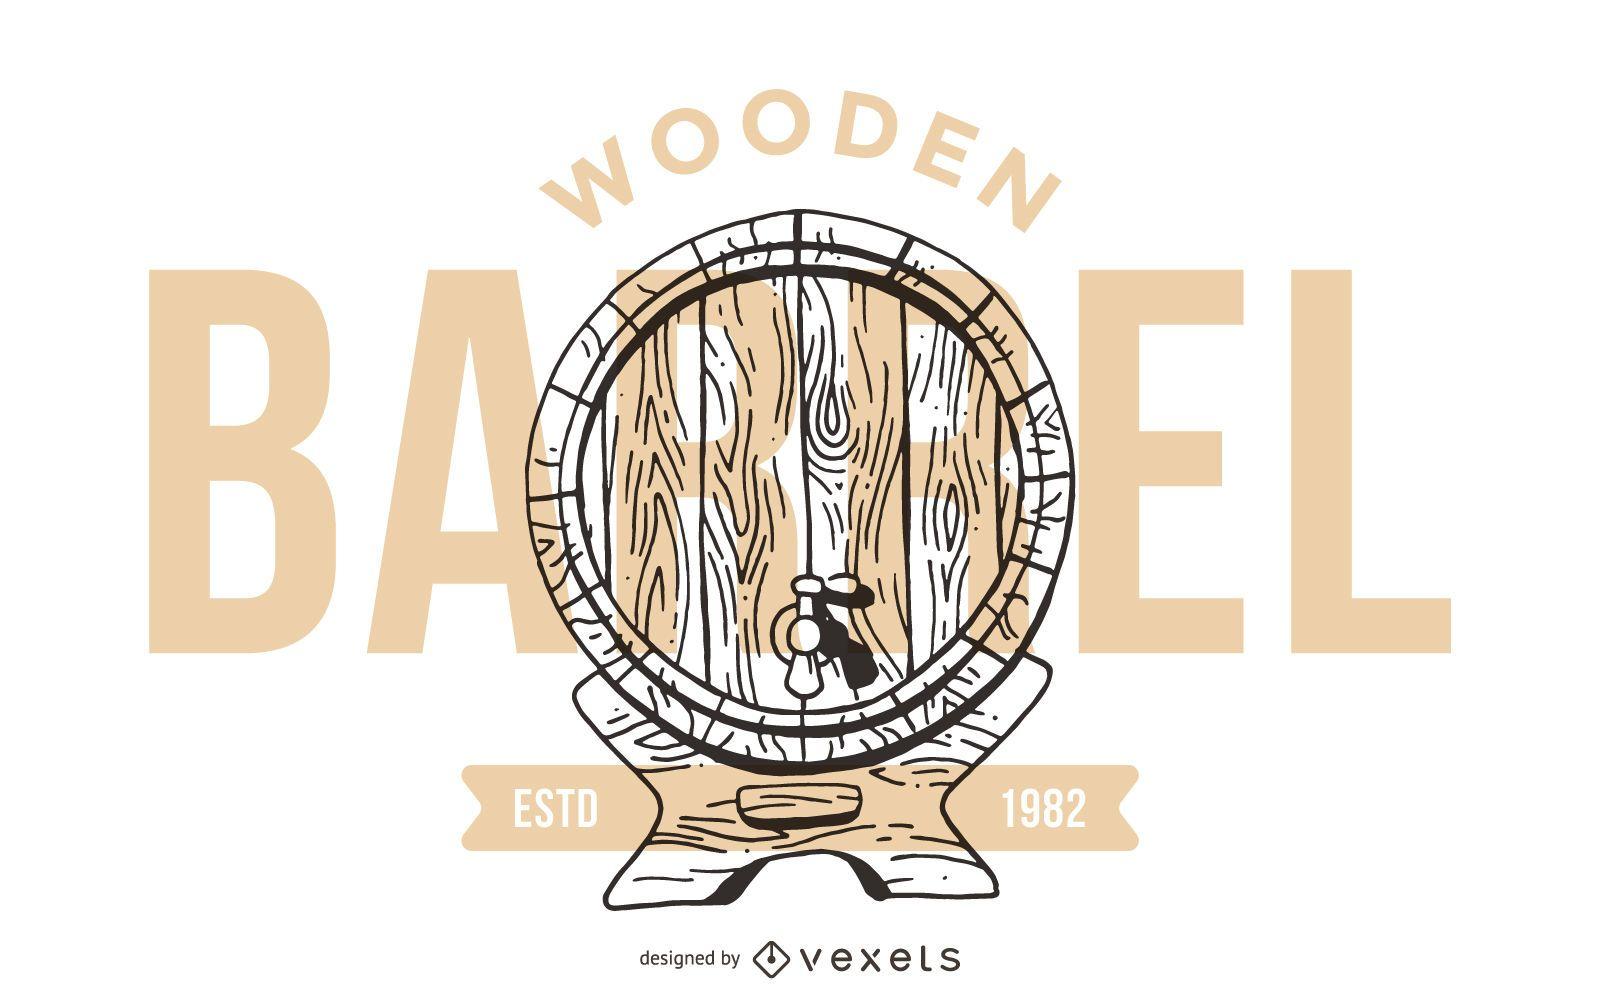 Wooden barrel logo design